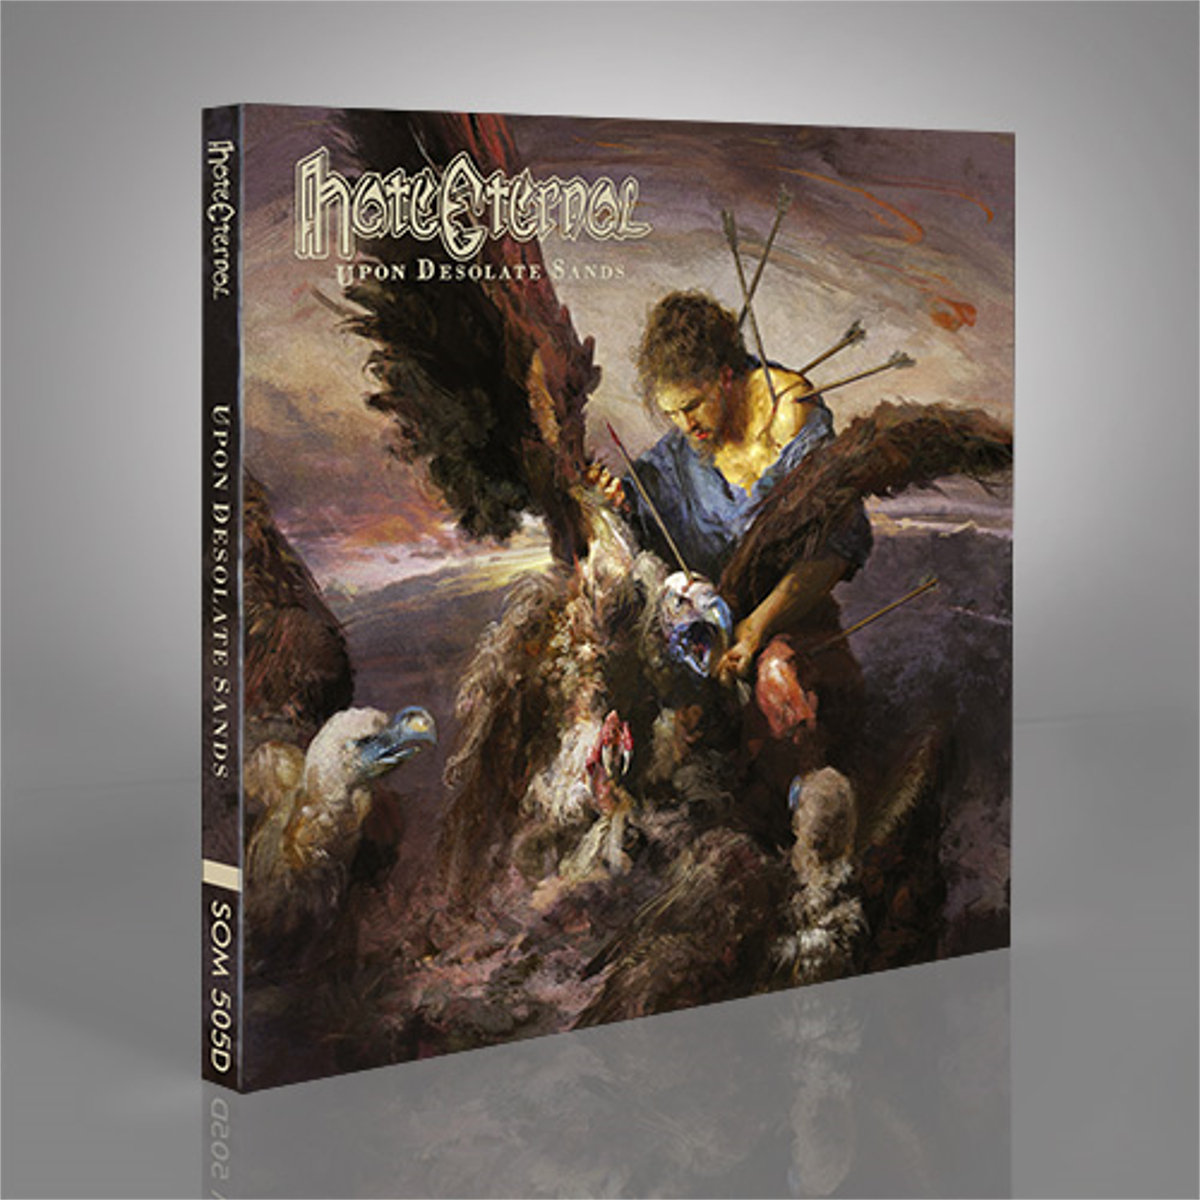 Eternal fucking darkness compilation